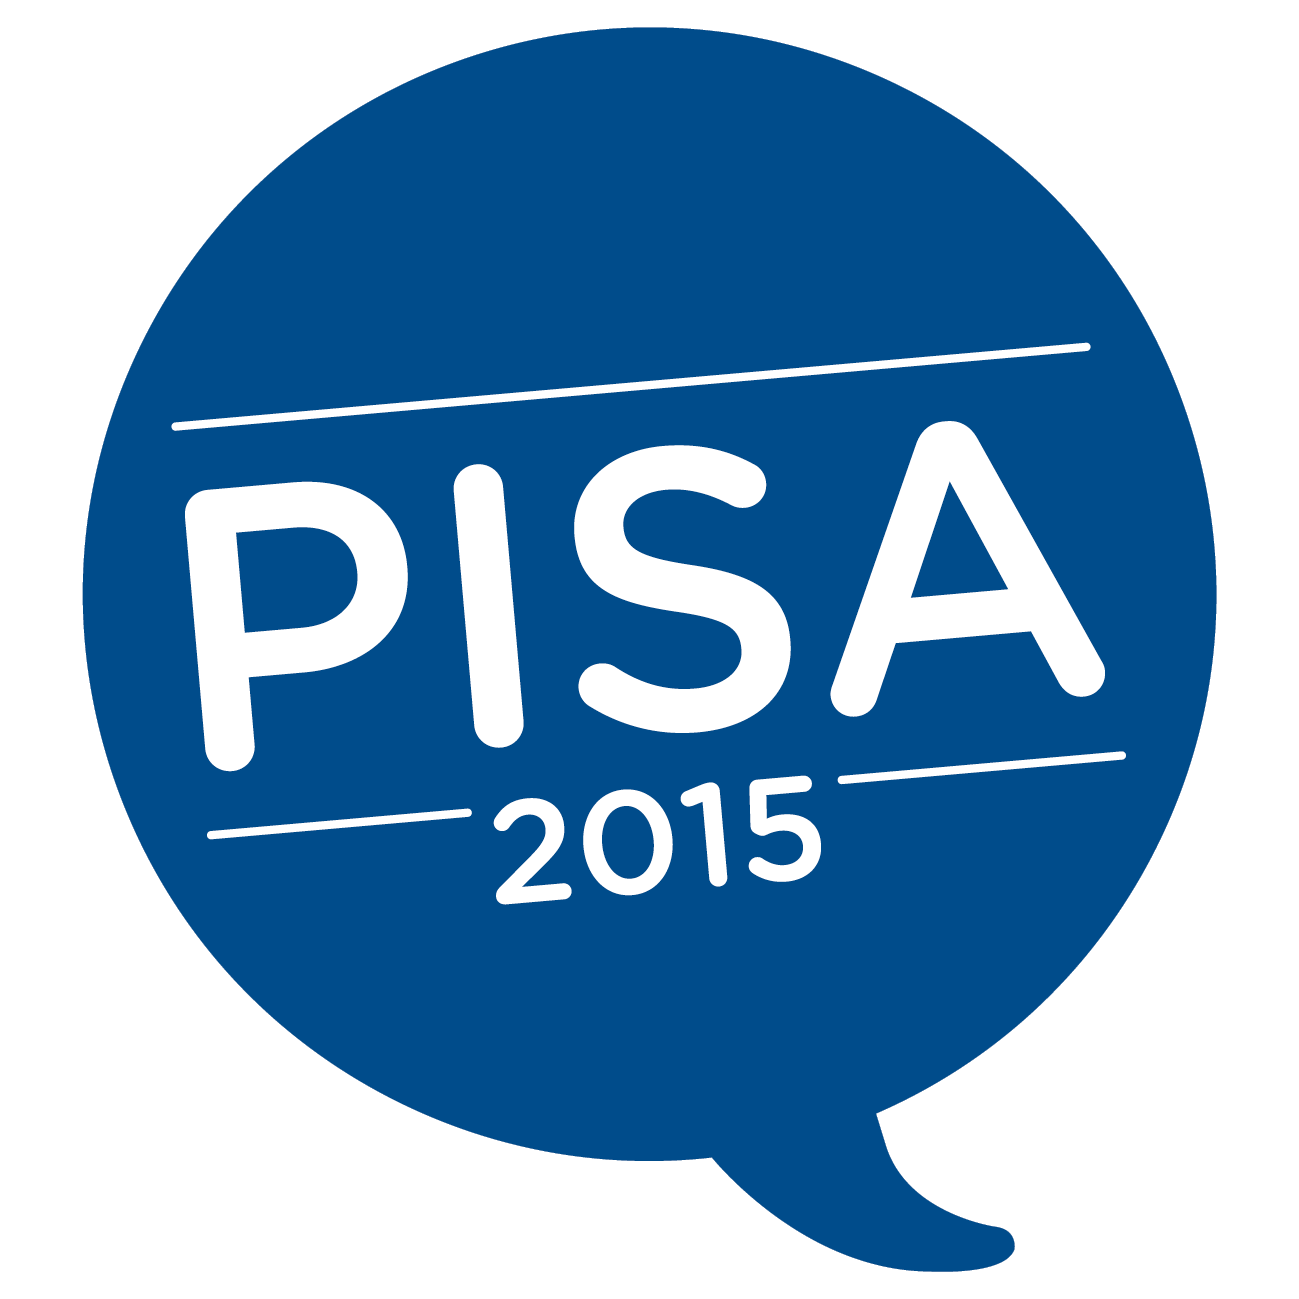 Logo PISA 2015